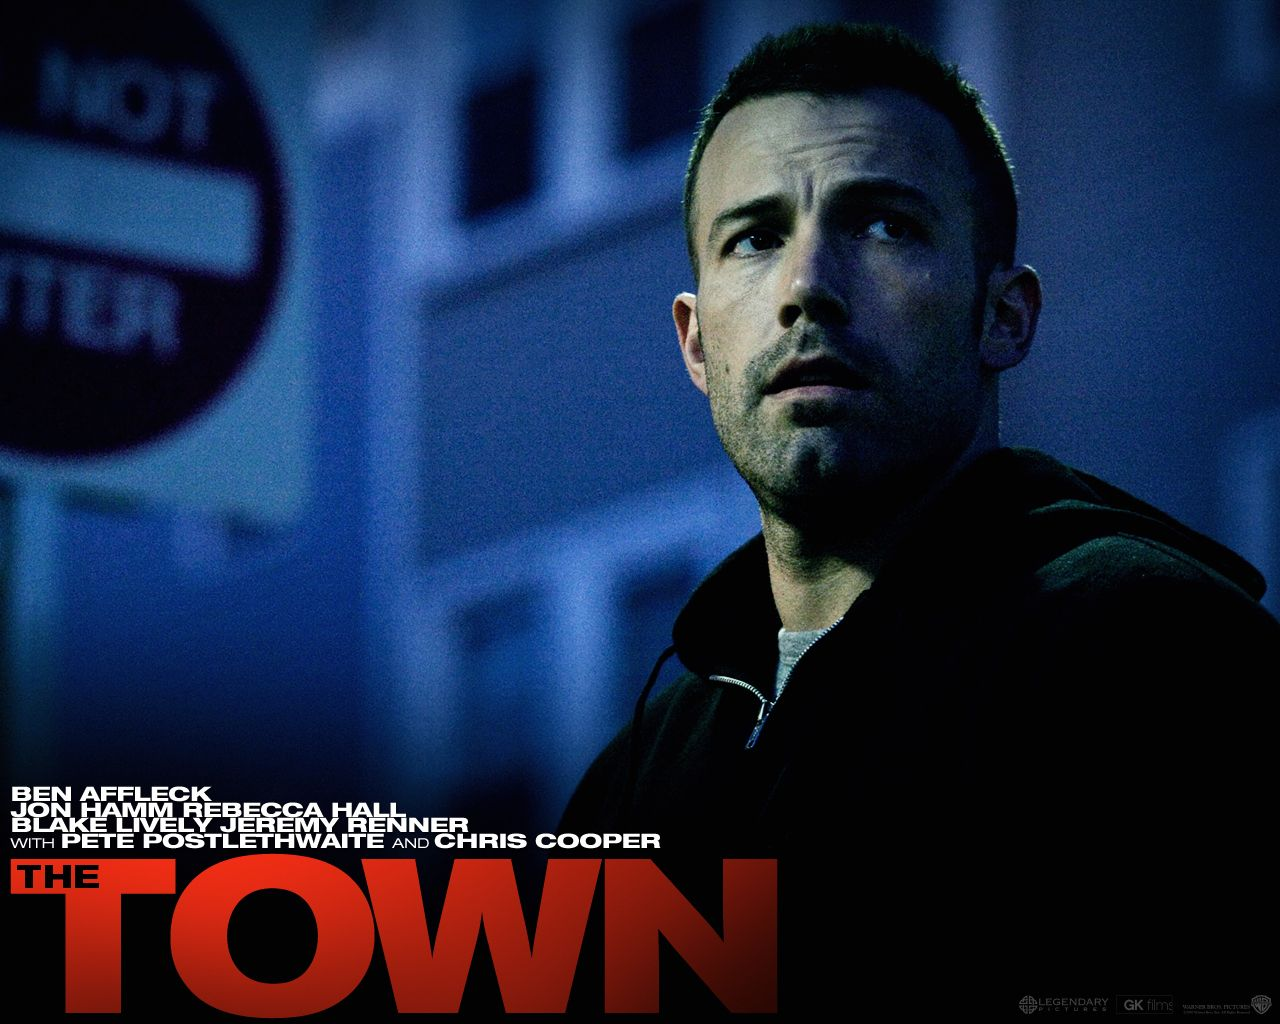 The Town - my Ben